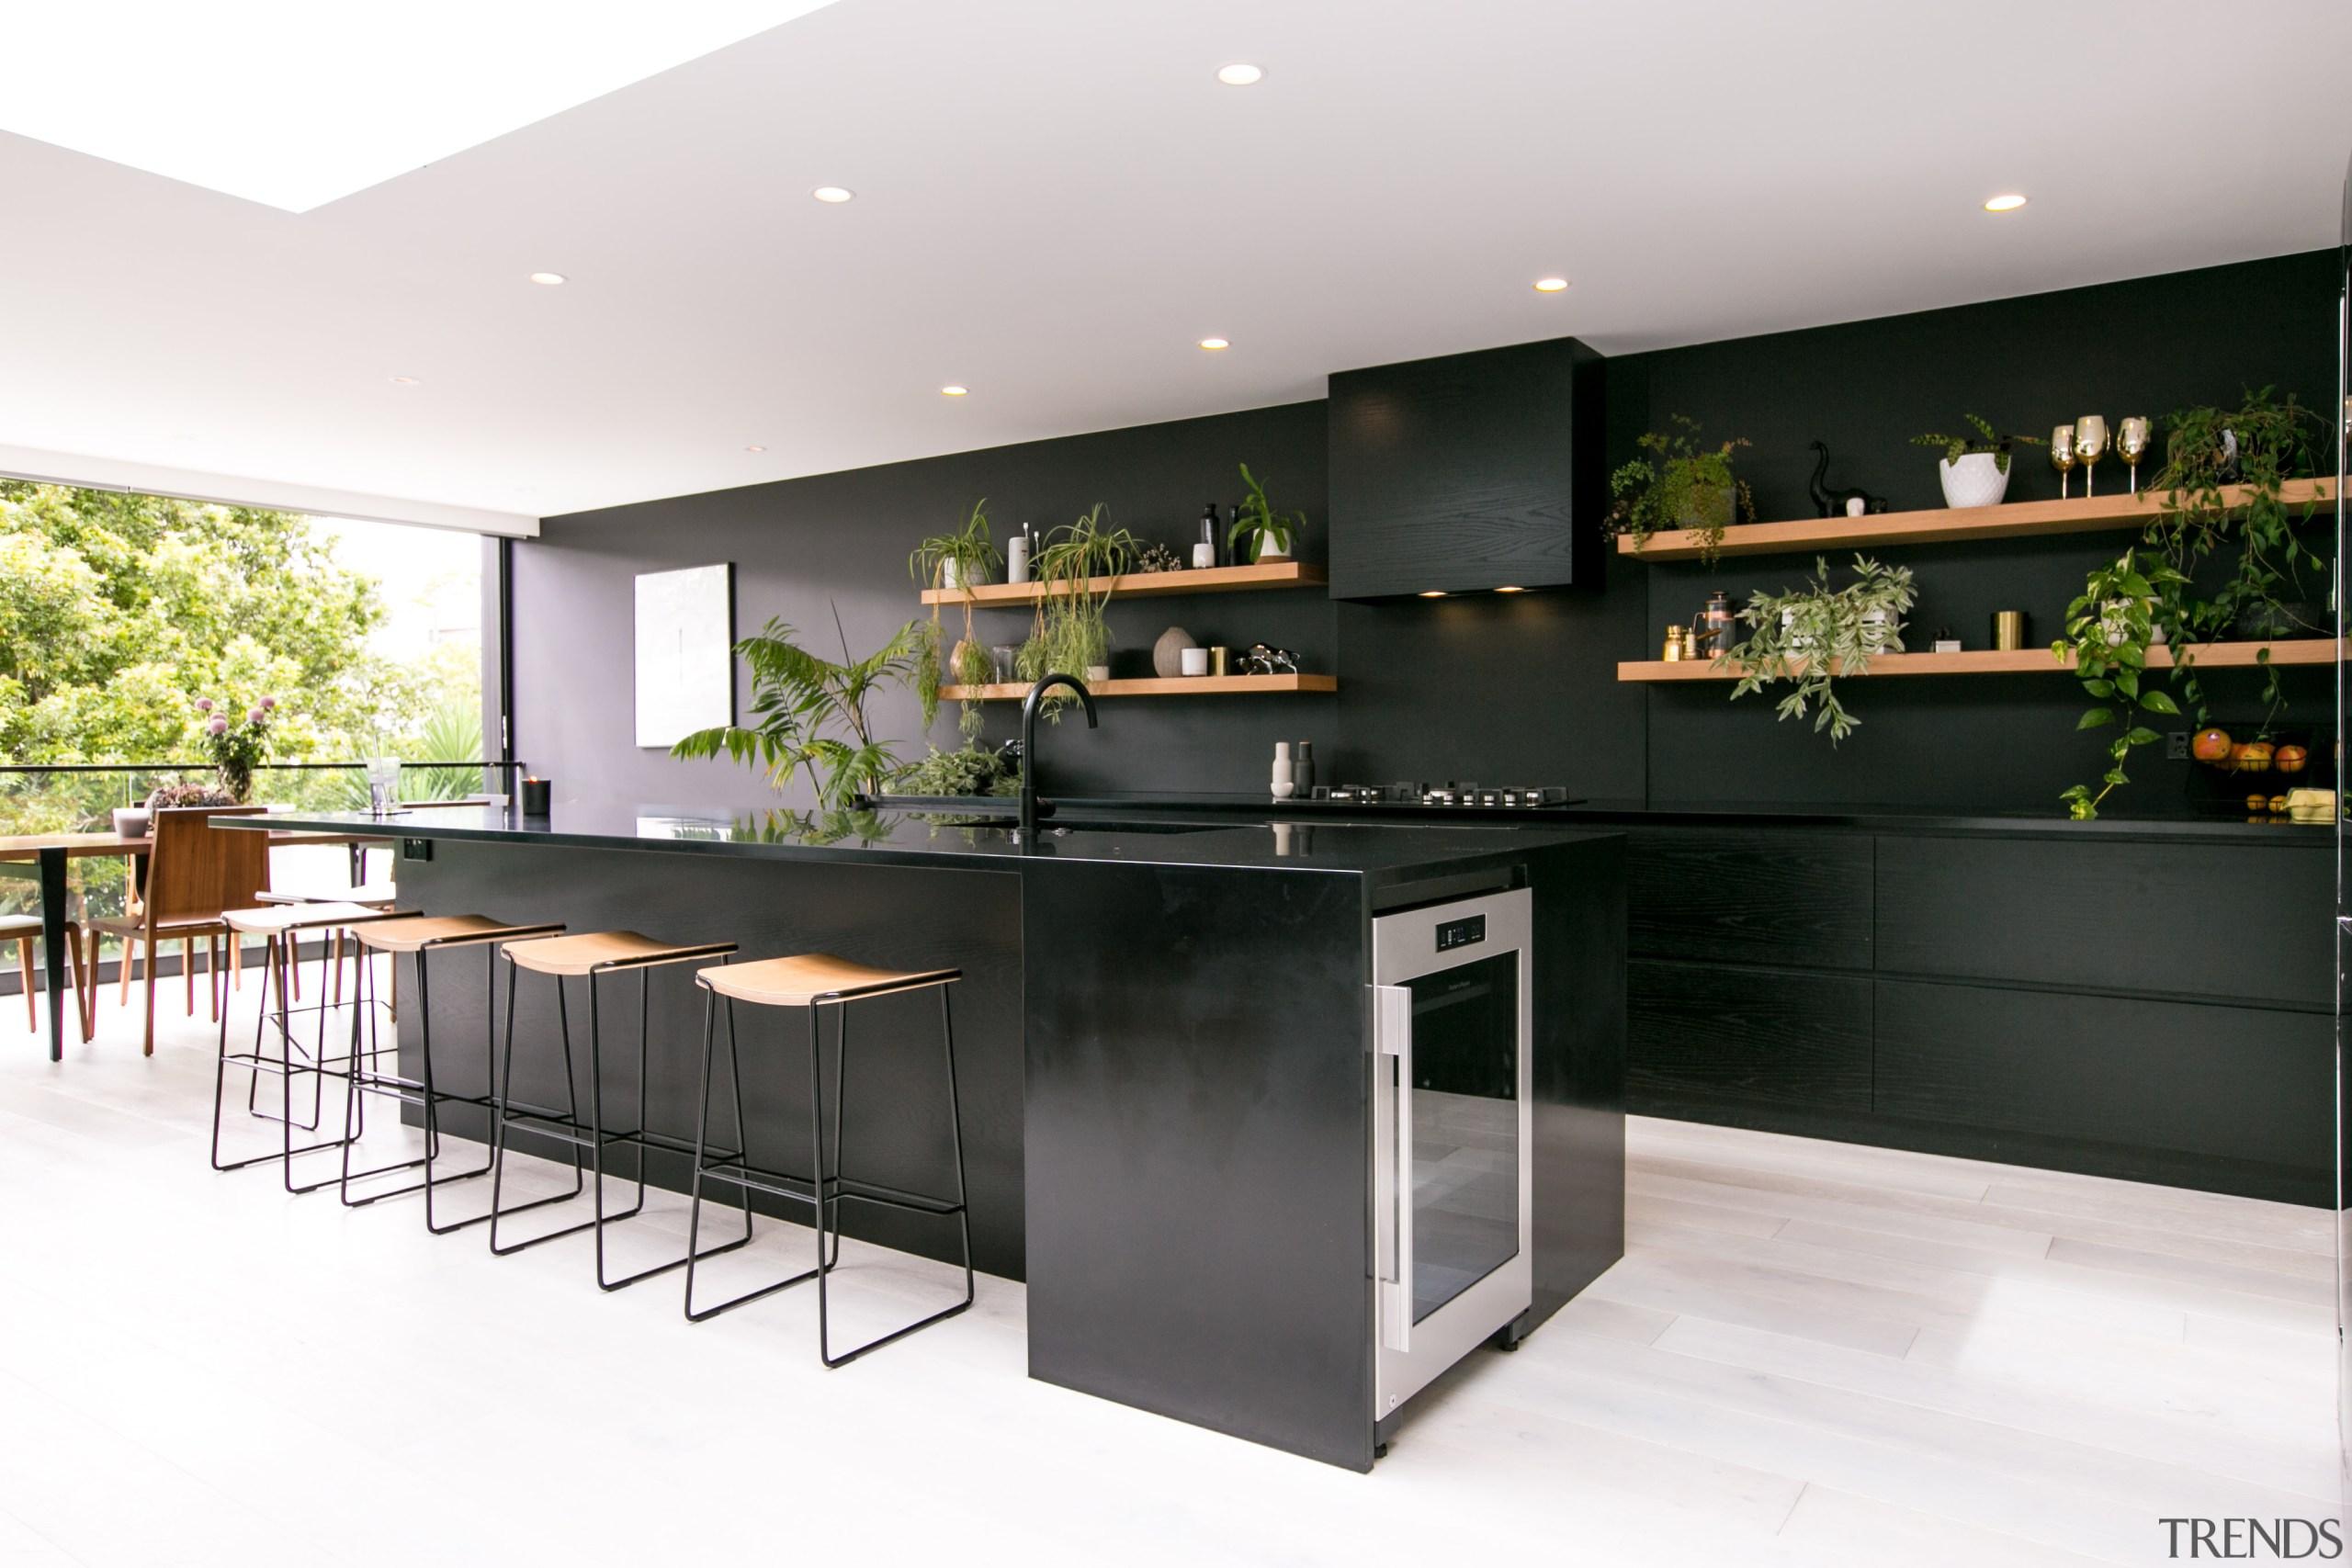 In this kitchen by architect Evelyn McNamara, Resene countertop, interior design, kitchen, white, black